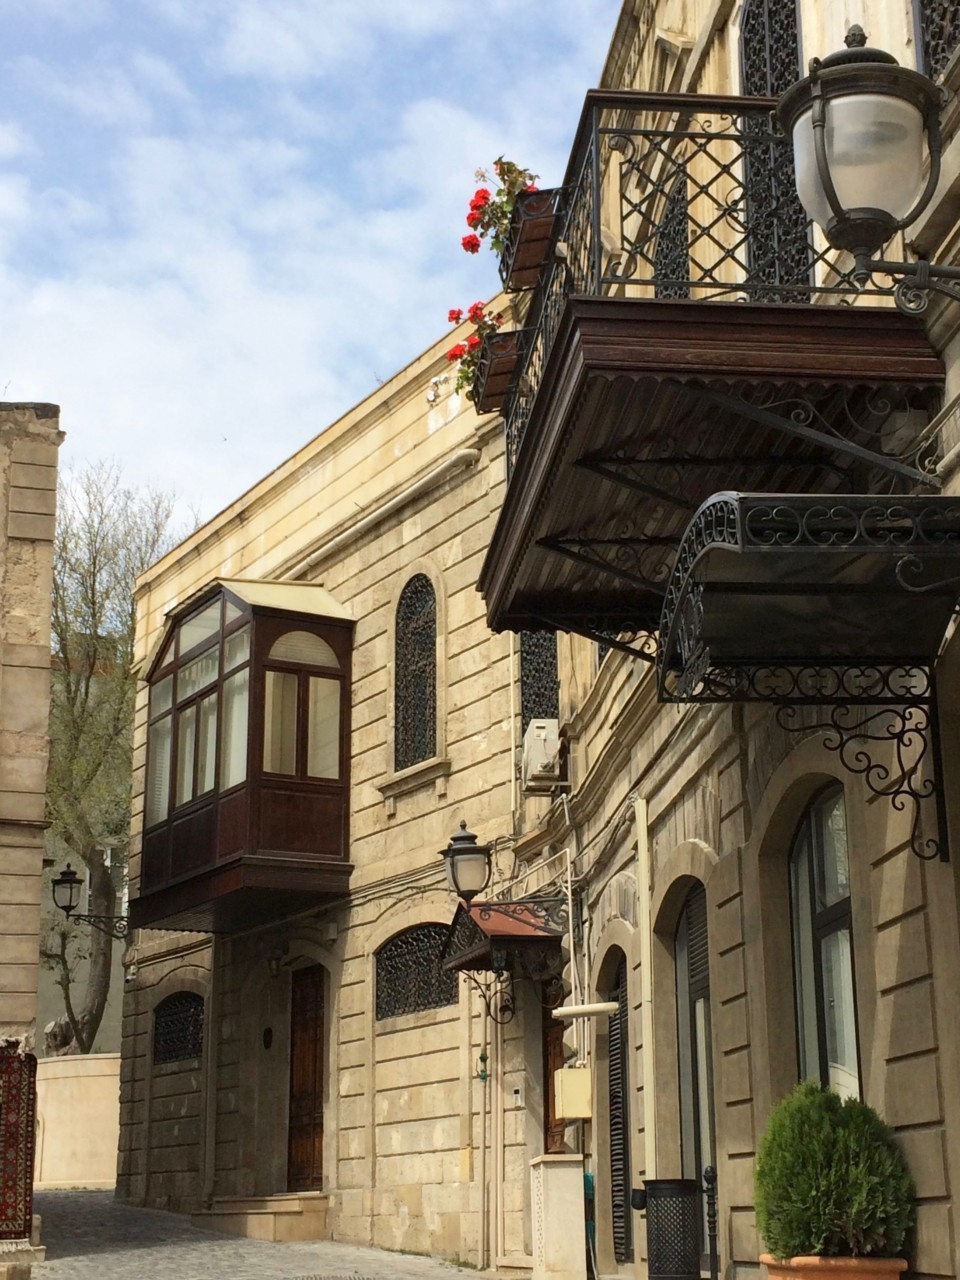 Baku streets and balconies